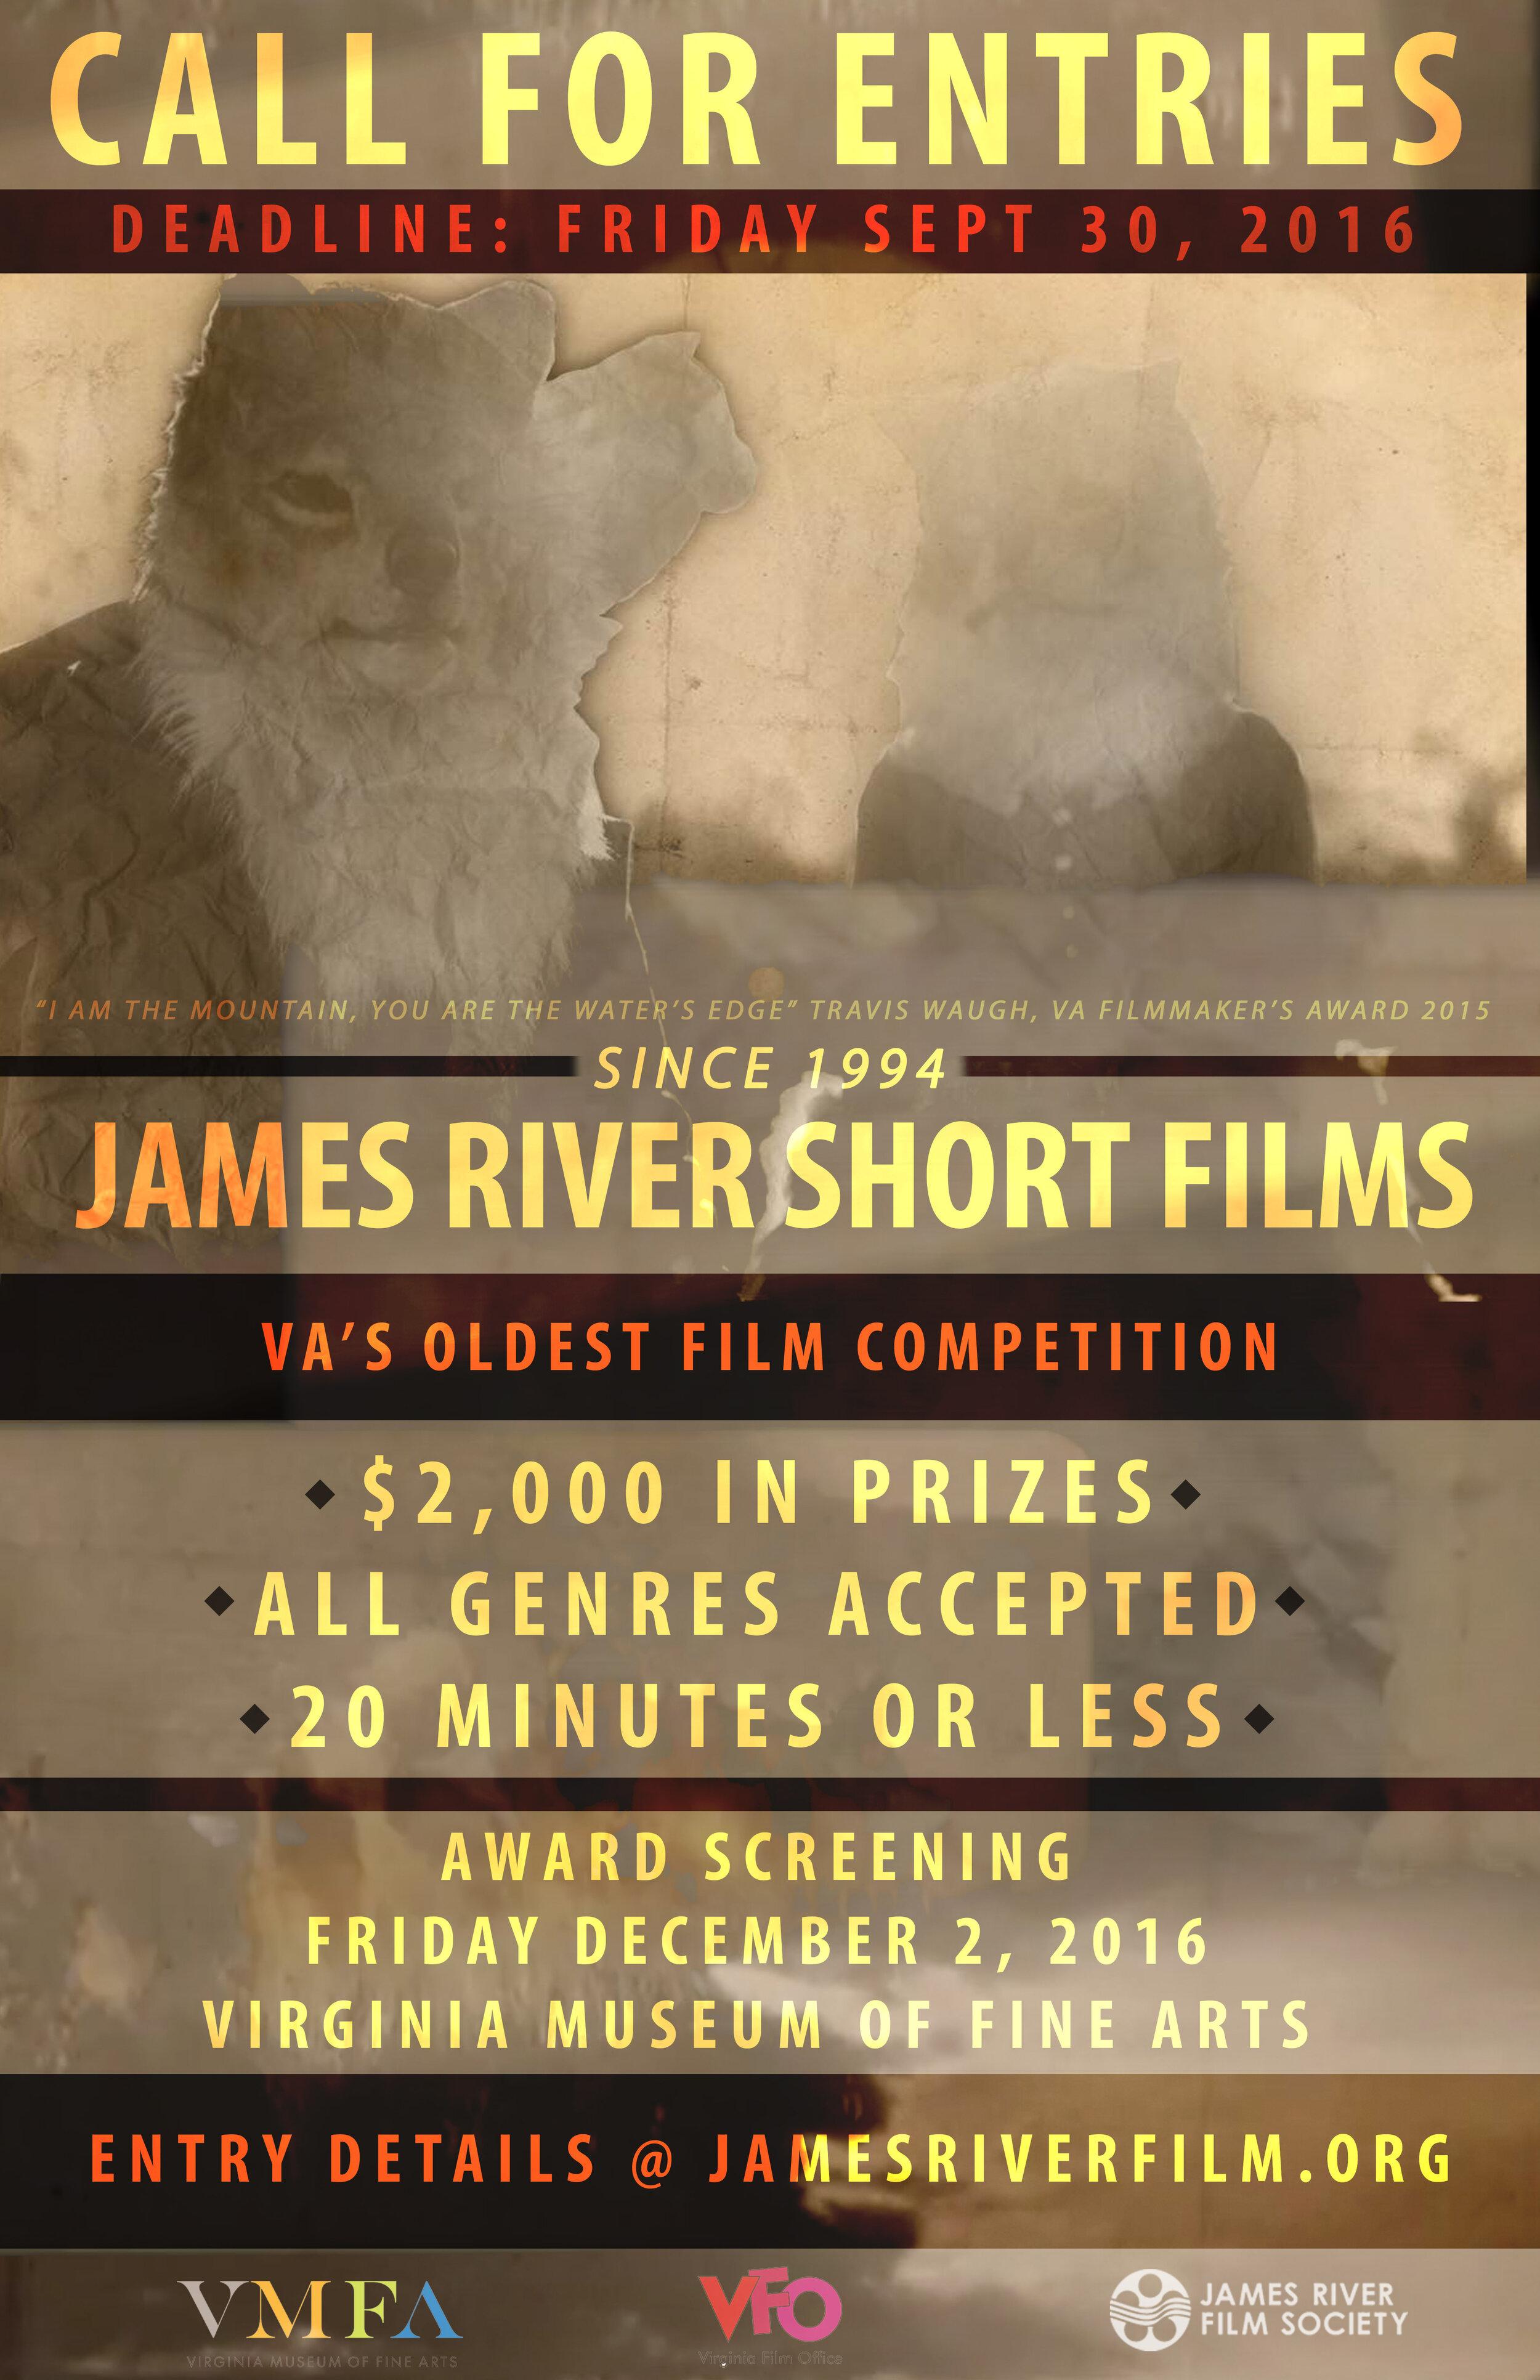 James-River-Short-Films-2016-poster.jpg